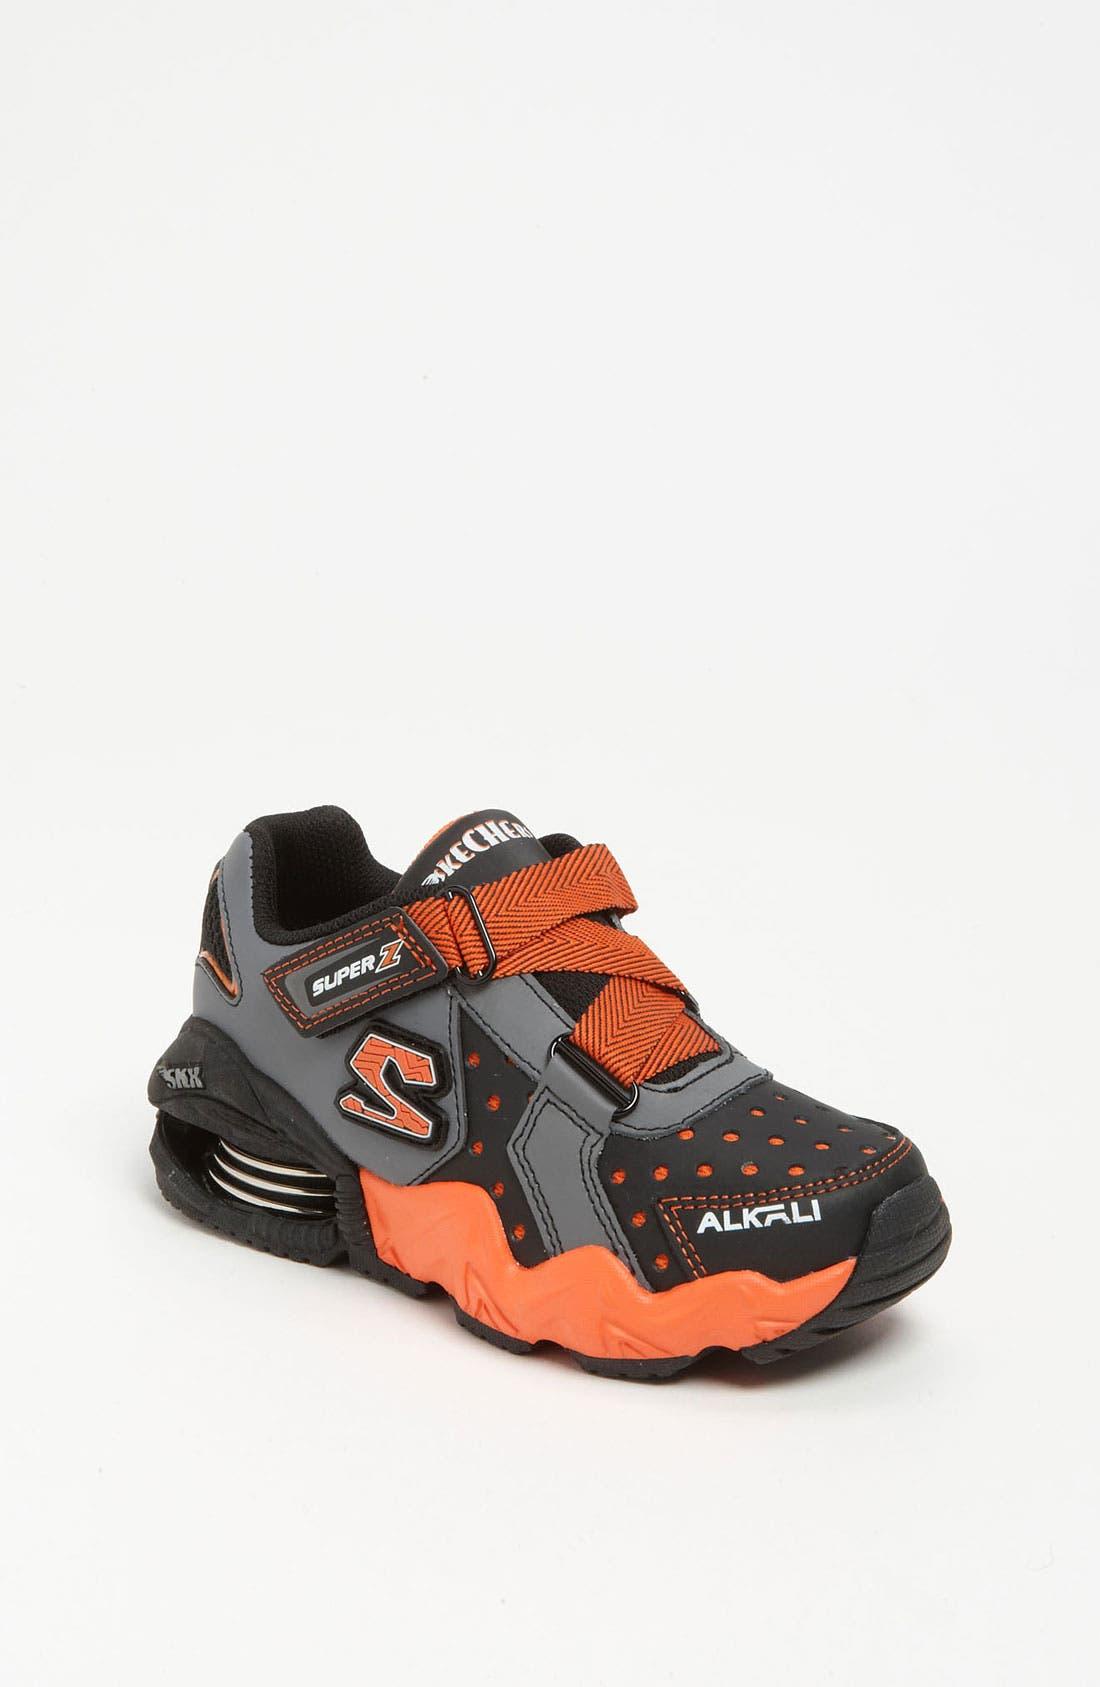 Main Image - SKECHERS 'Alkali' Sneaker (Toddler, Little Kid & Big Kid)